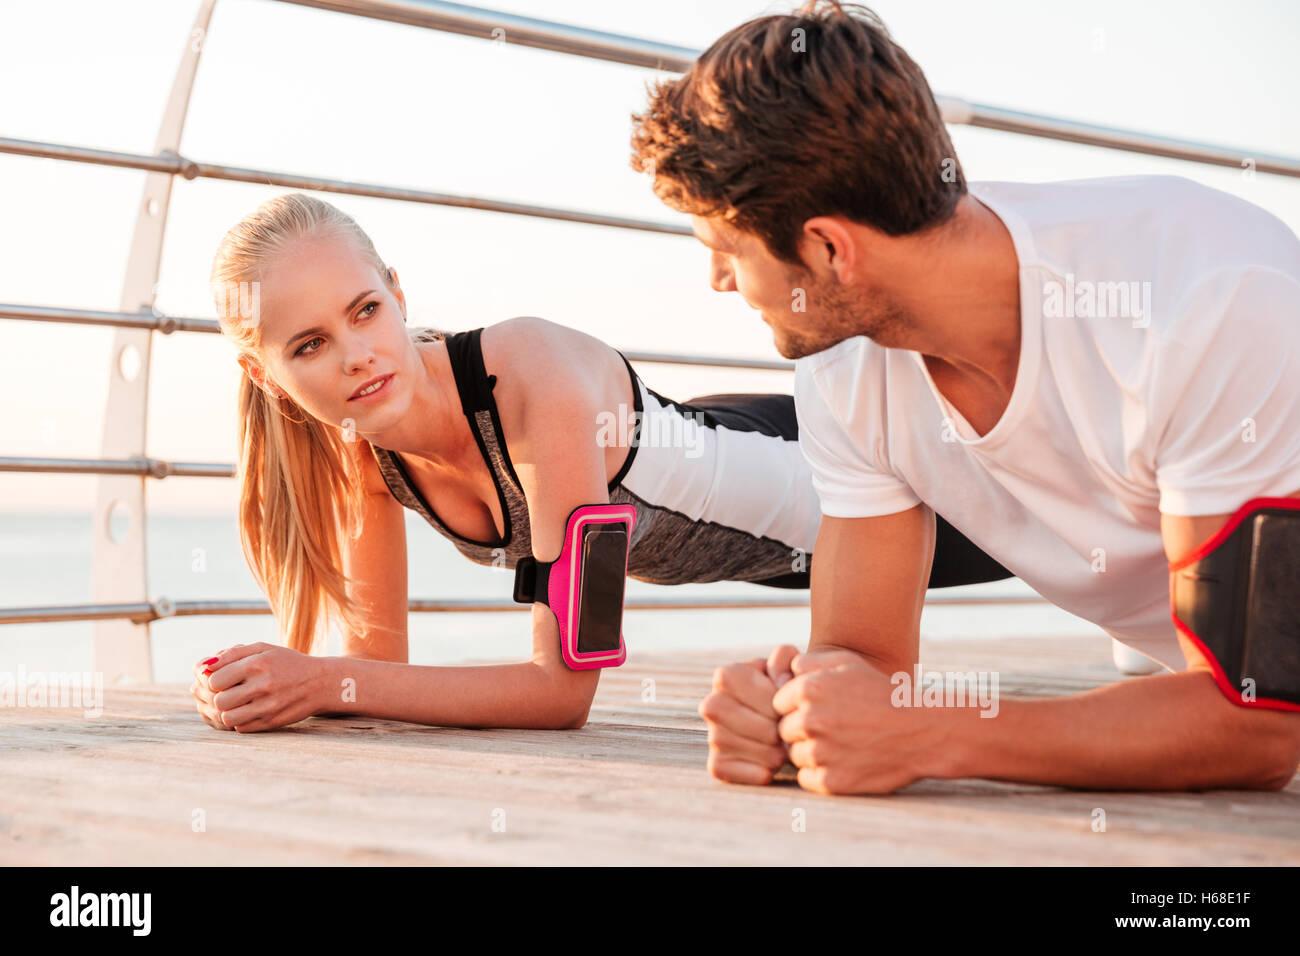 Close up of a young woman and man fitness planche faire exercice ensemble en plein air sur le quai Photo Stock